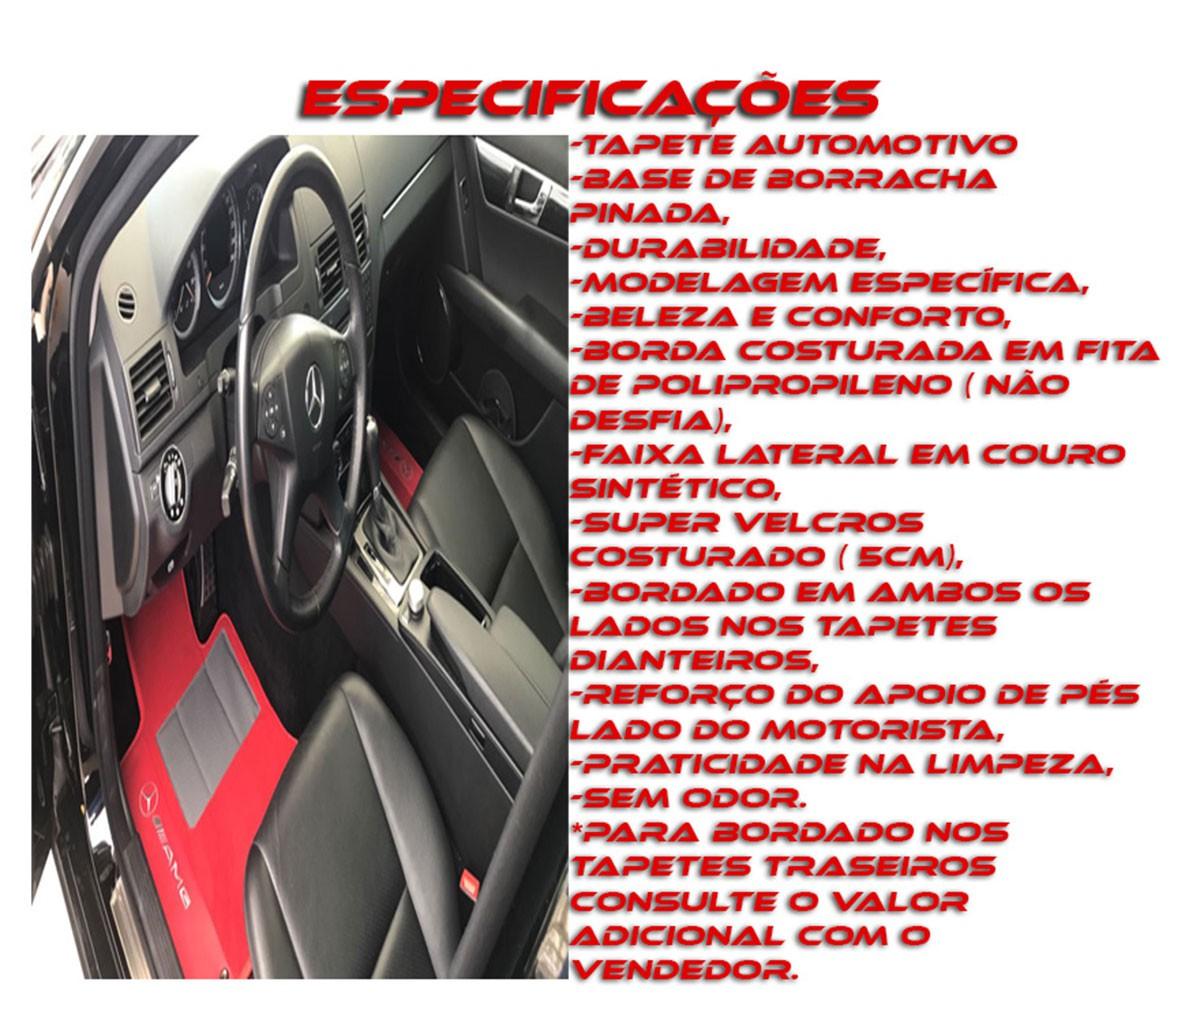 Tapete Camaro Carpete  Luxo Base Pinada, Hitto O Melhor!